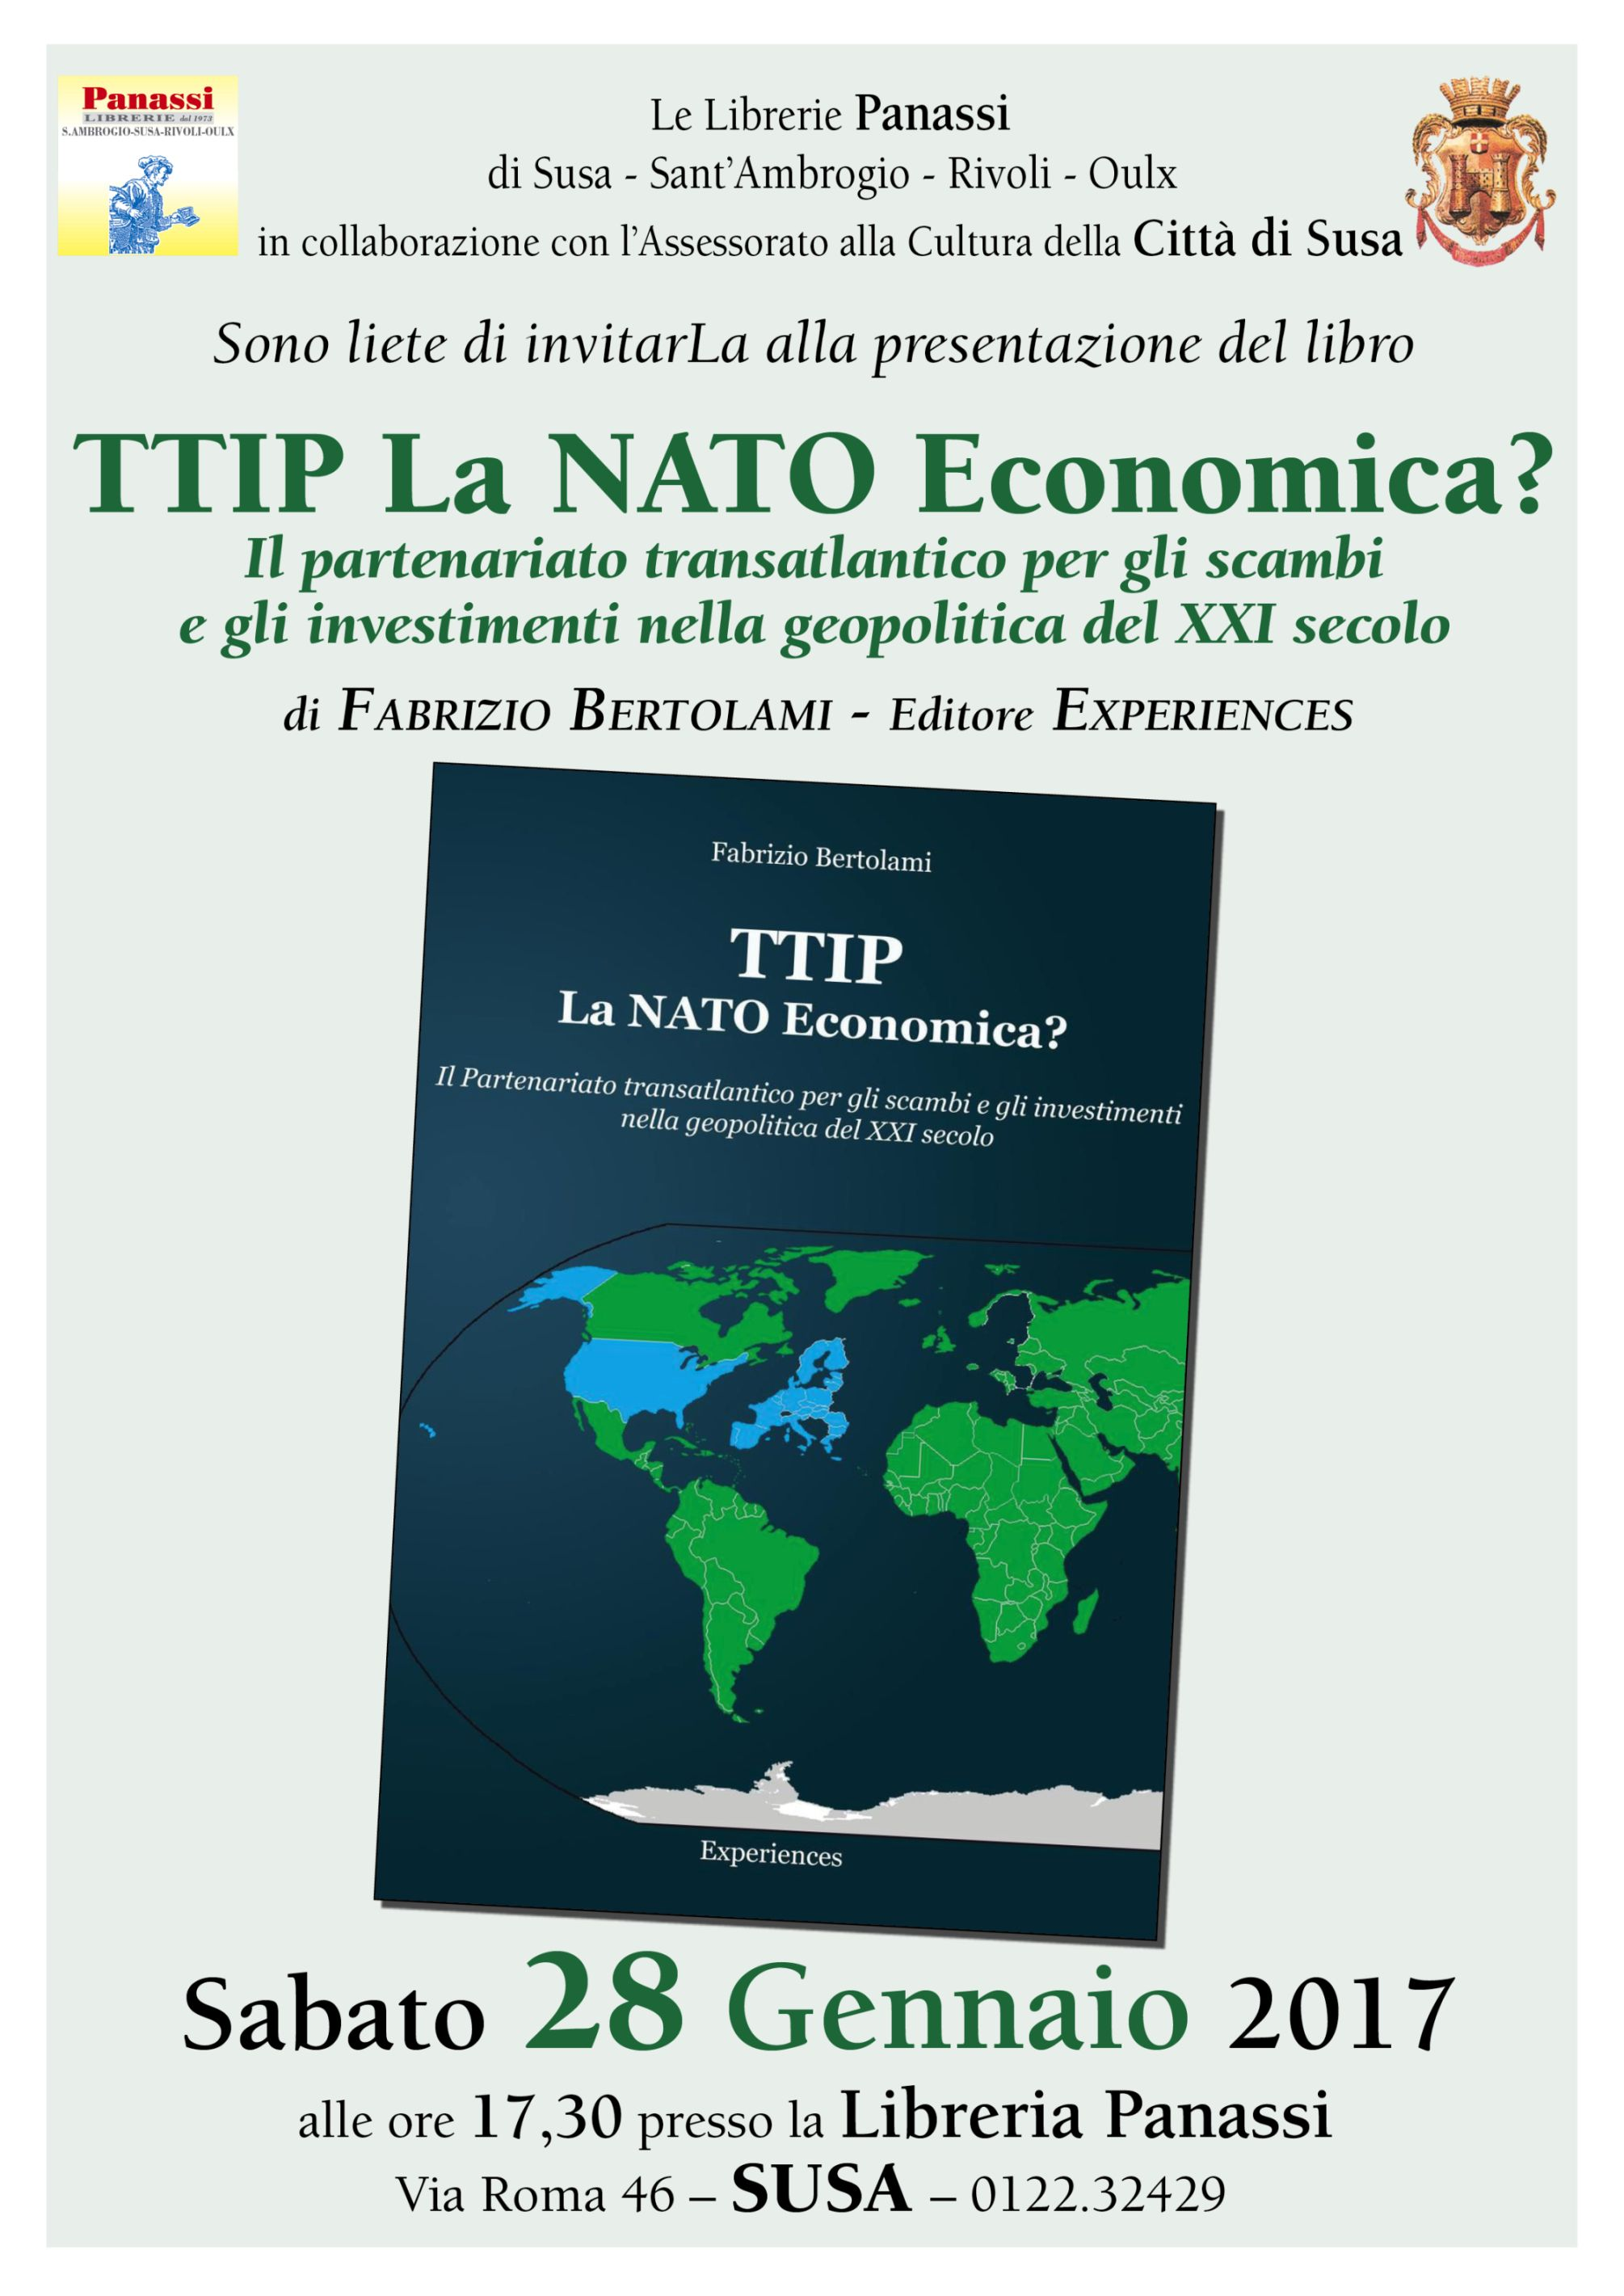 TTIP Panassi bis